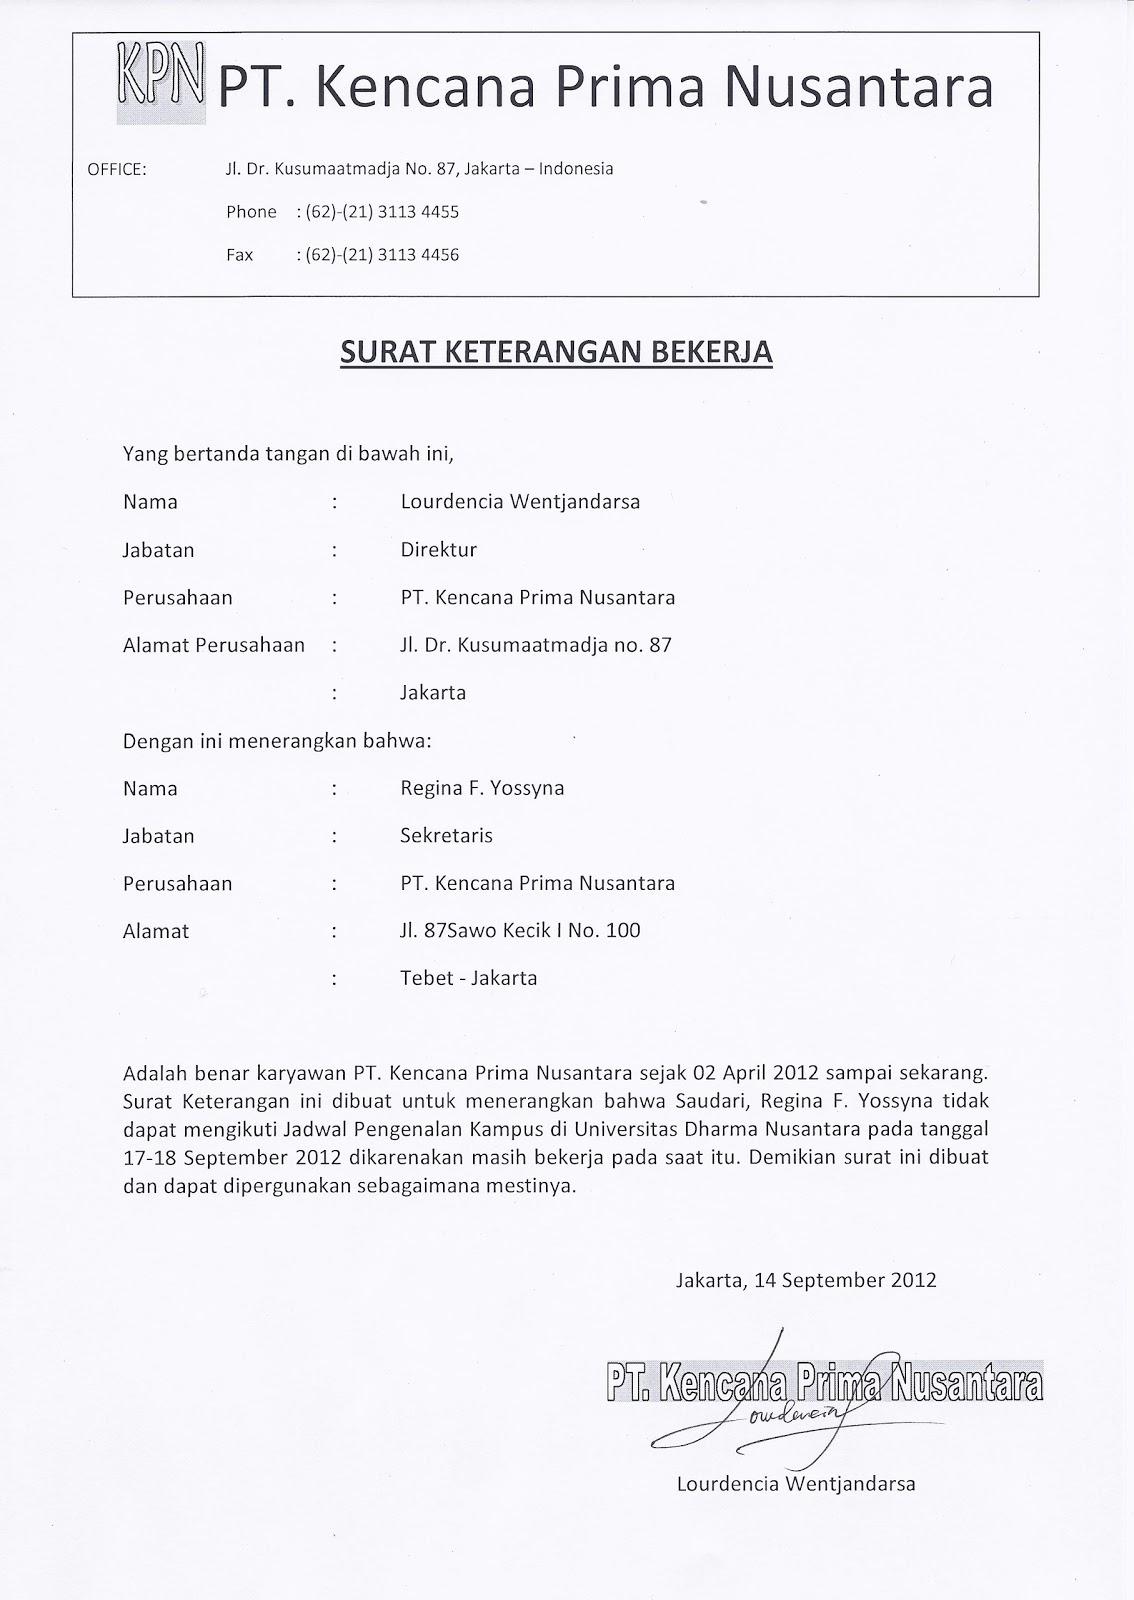 Catatan Iseng Surat Keterangan Bekerja Untuk Kampus